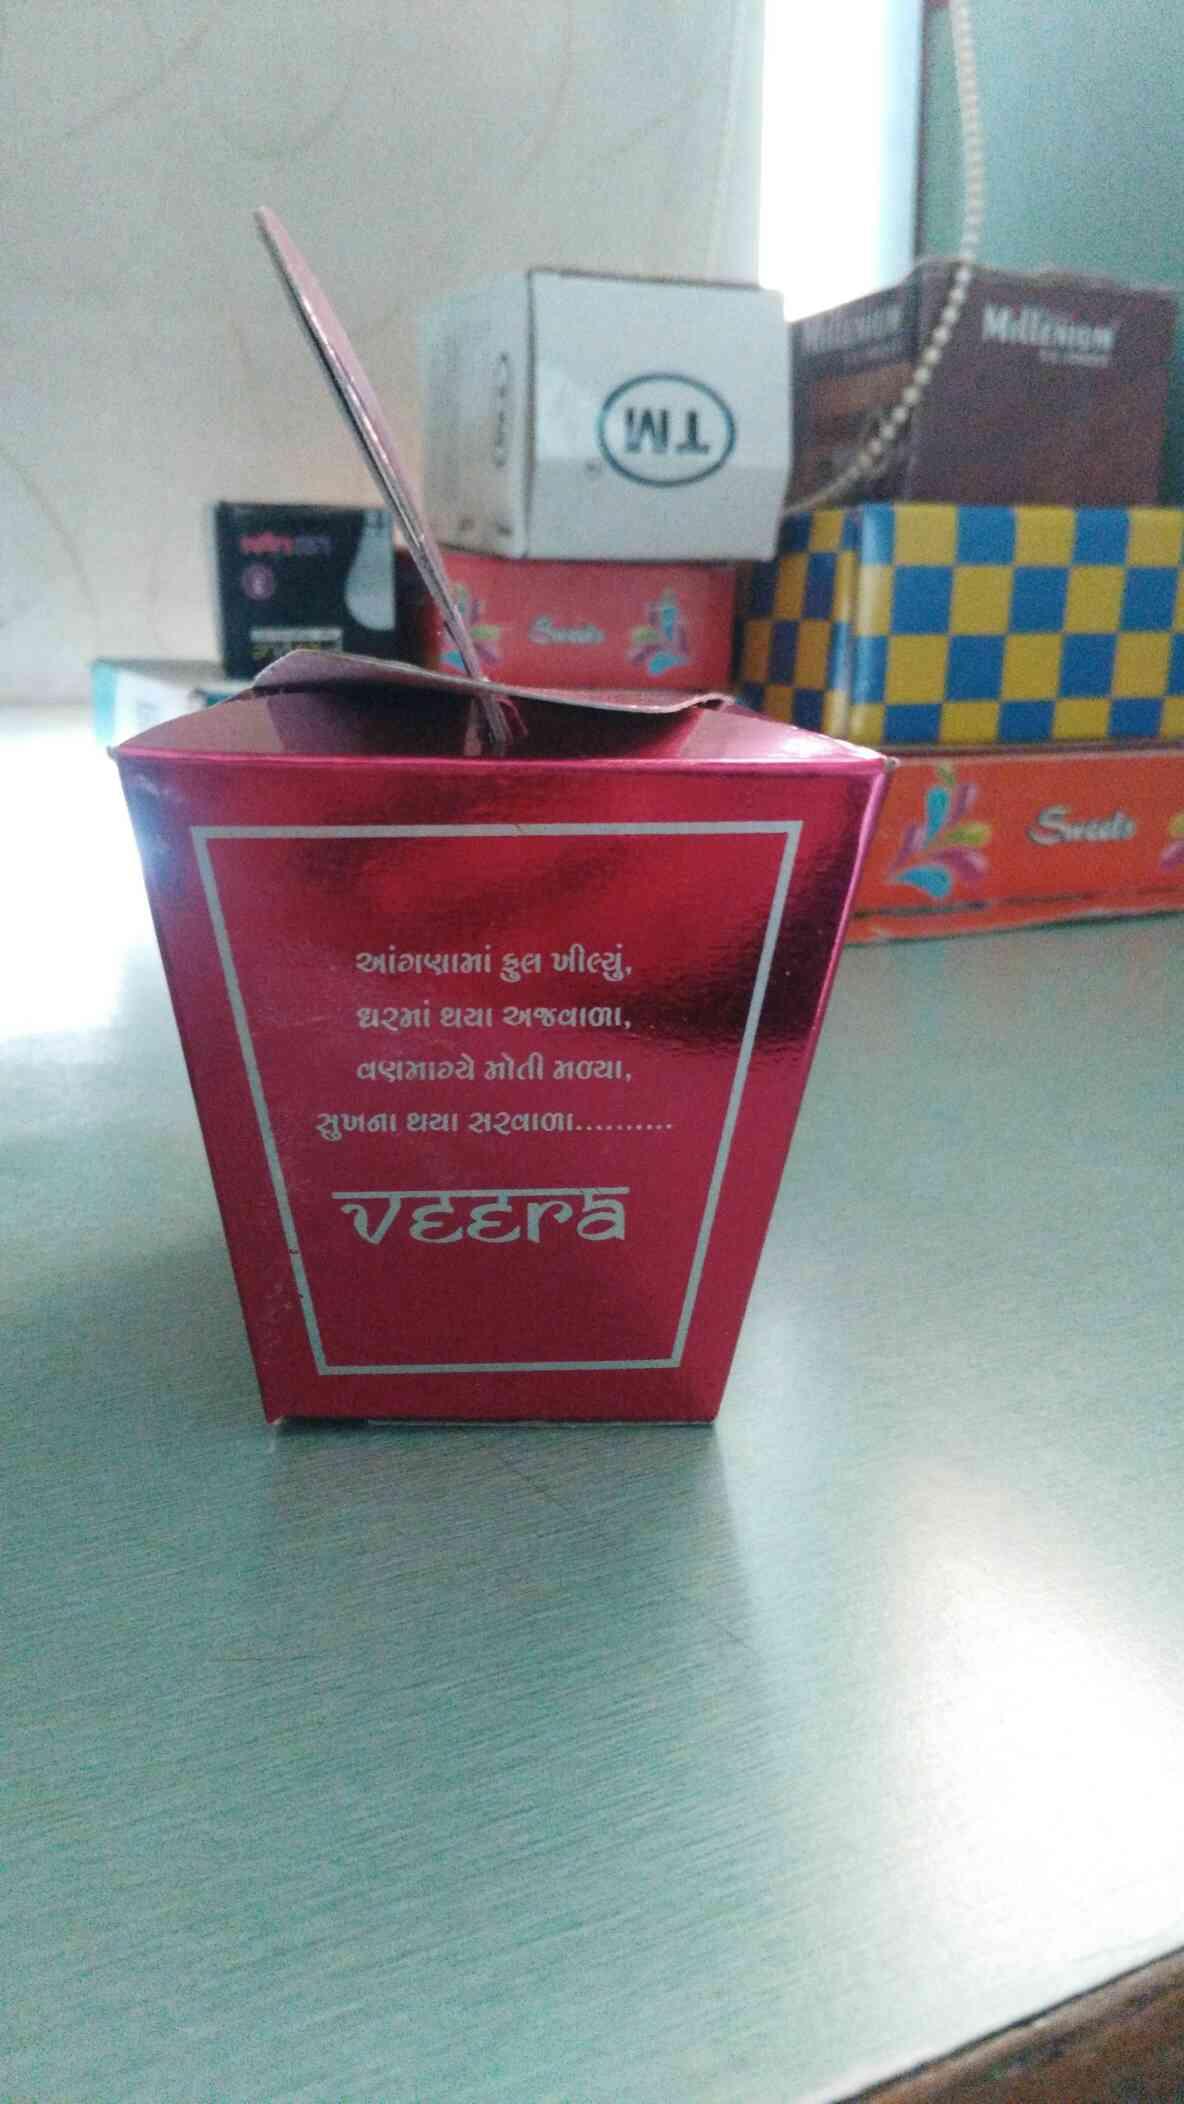 vikas printers in Sweet penda box mist matika duplex box with printing  & all color & maximum shape available  from : vipul patel cell : 94272 23303